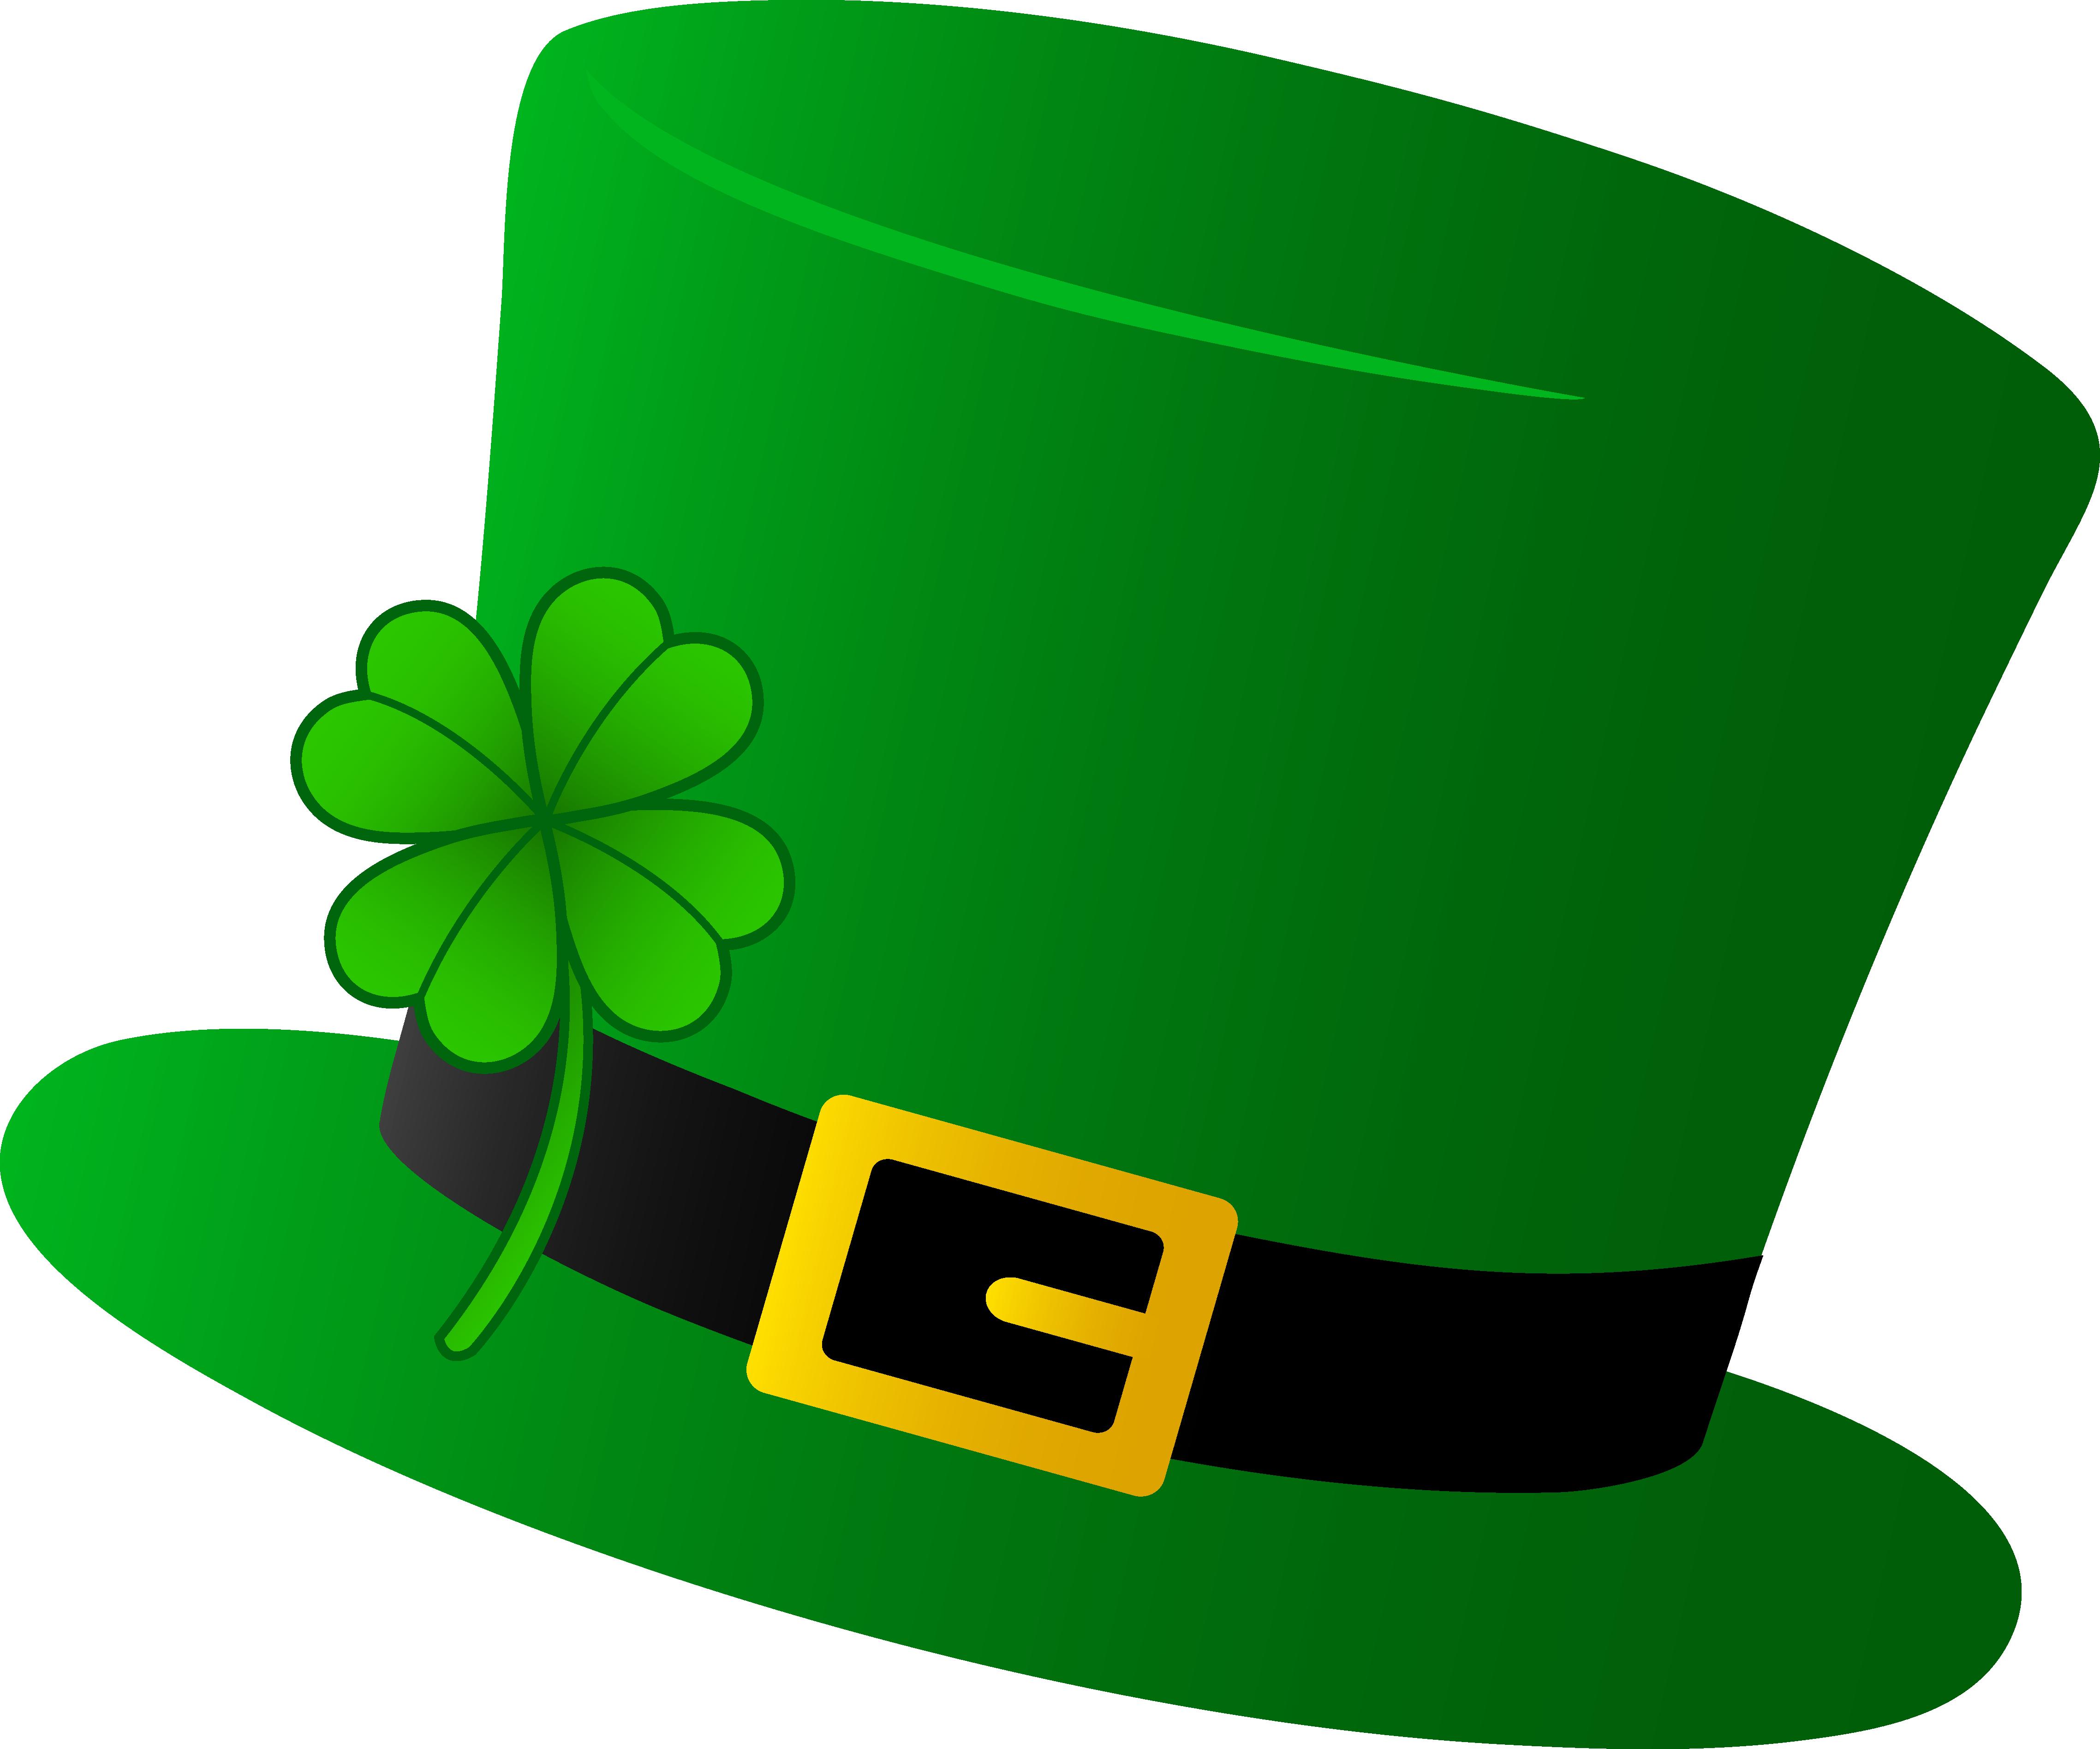 Leprechaun Hat Google Search St Patricks Day Hat St Patricks Day Clipart St Patricks Day Pictures